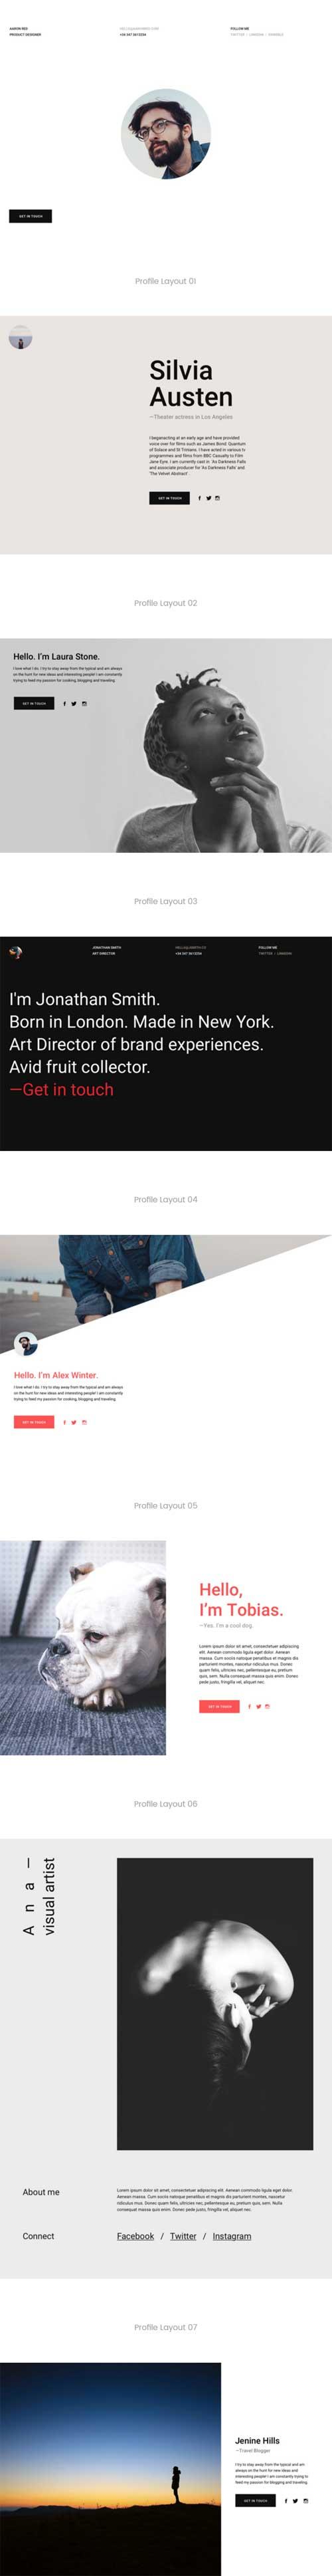 divi profile page layout